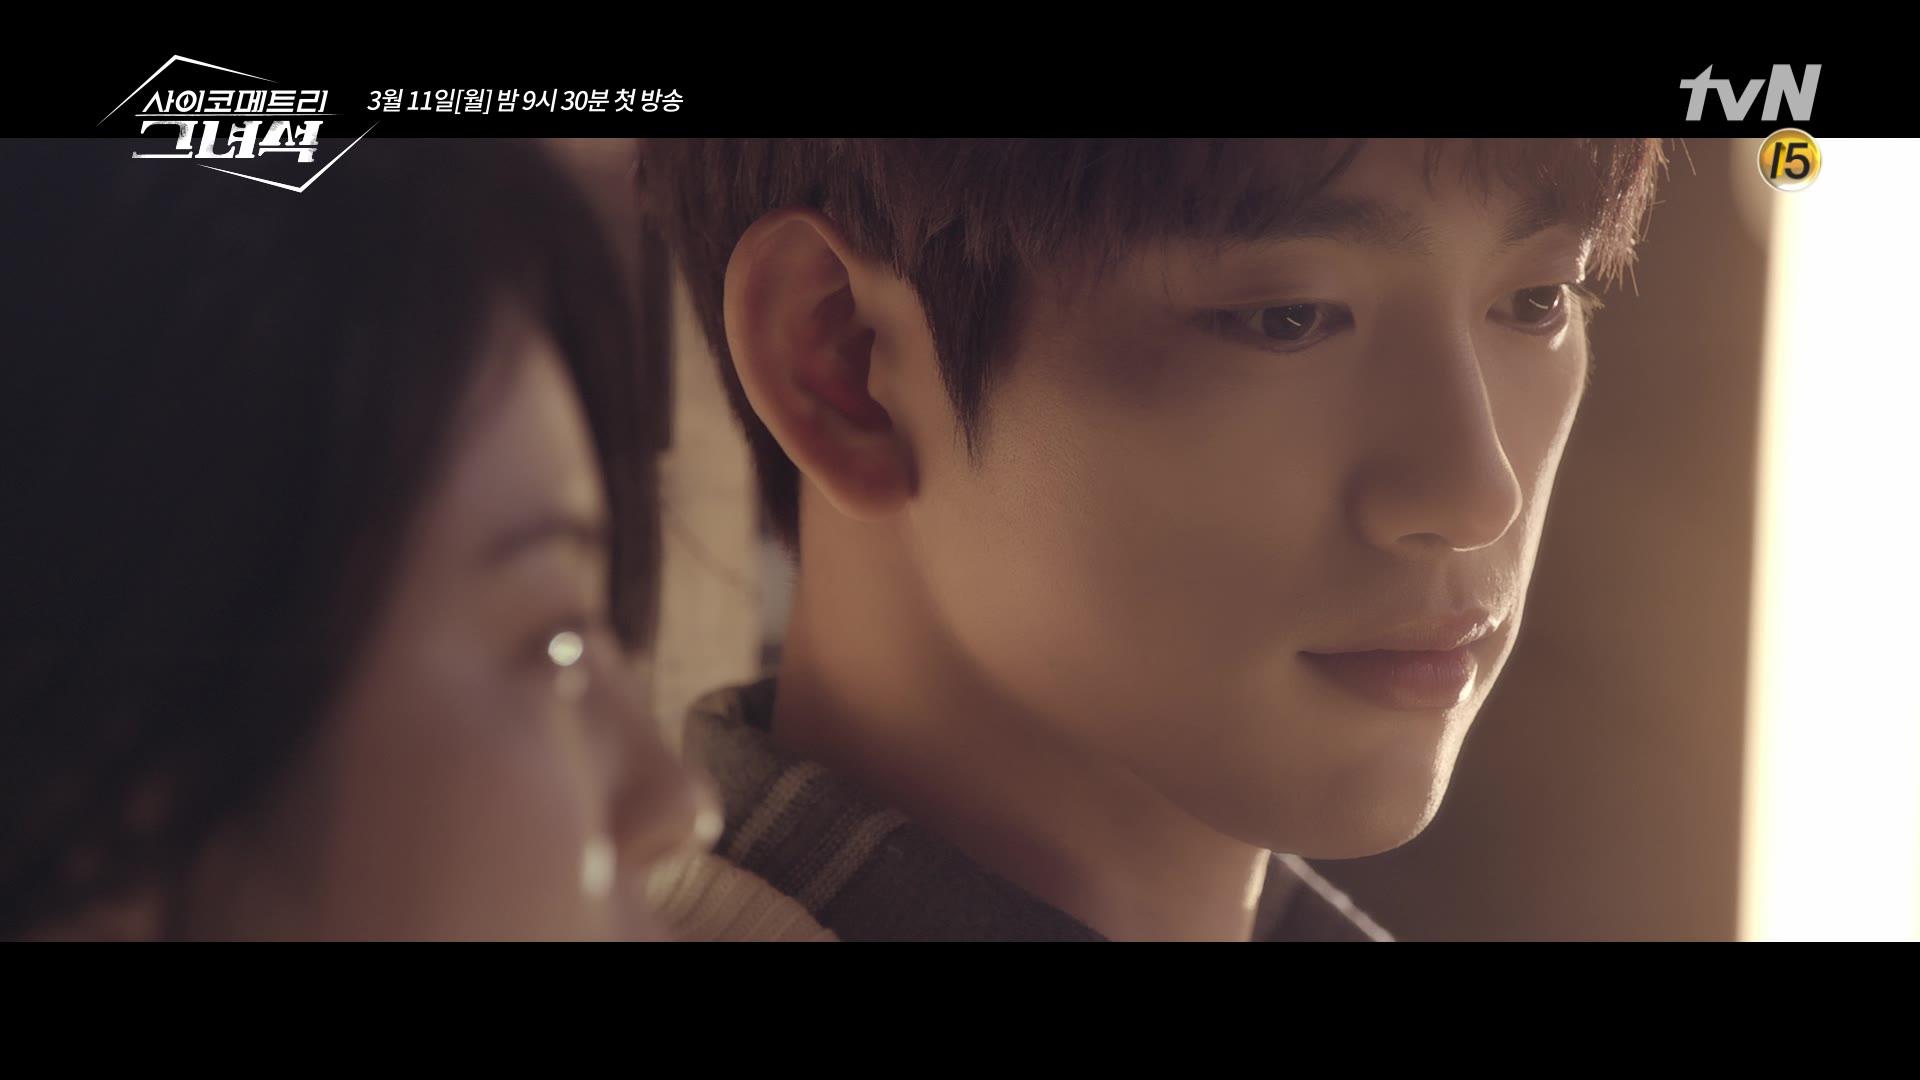 Secret Teaser 3 - Lee Ahn: Él es sicométrico